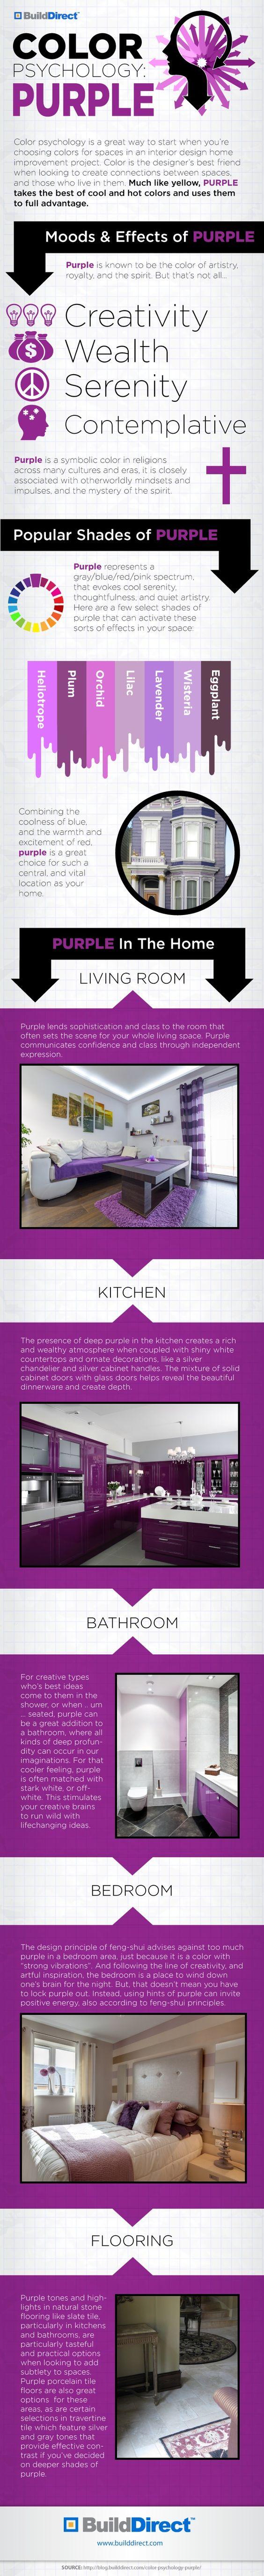 emotional interior design using purple paint palettes